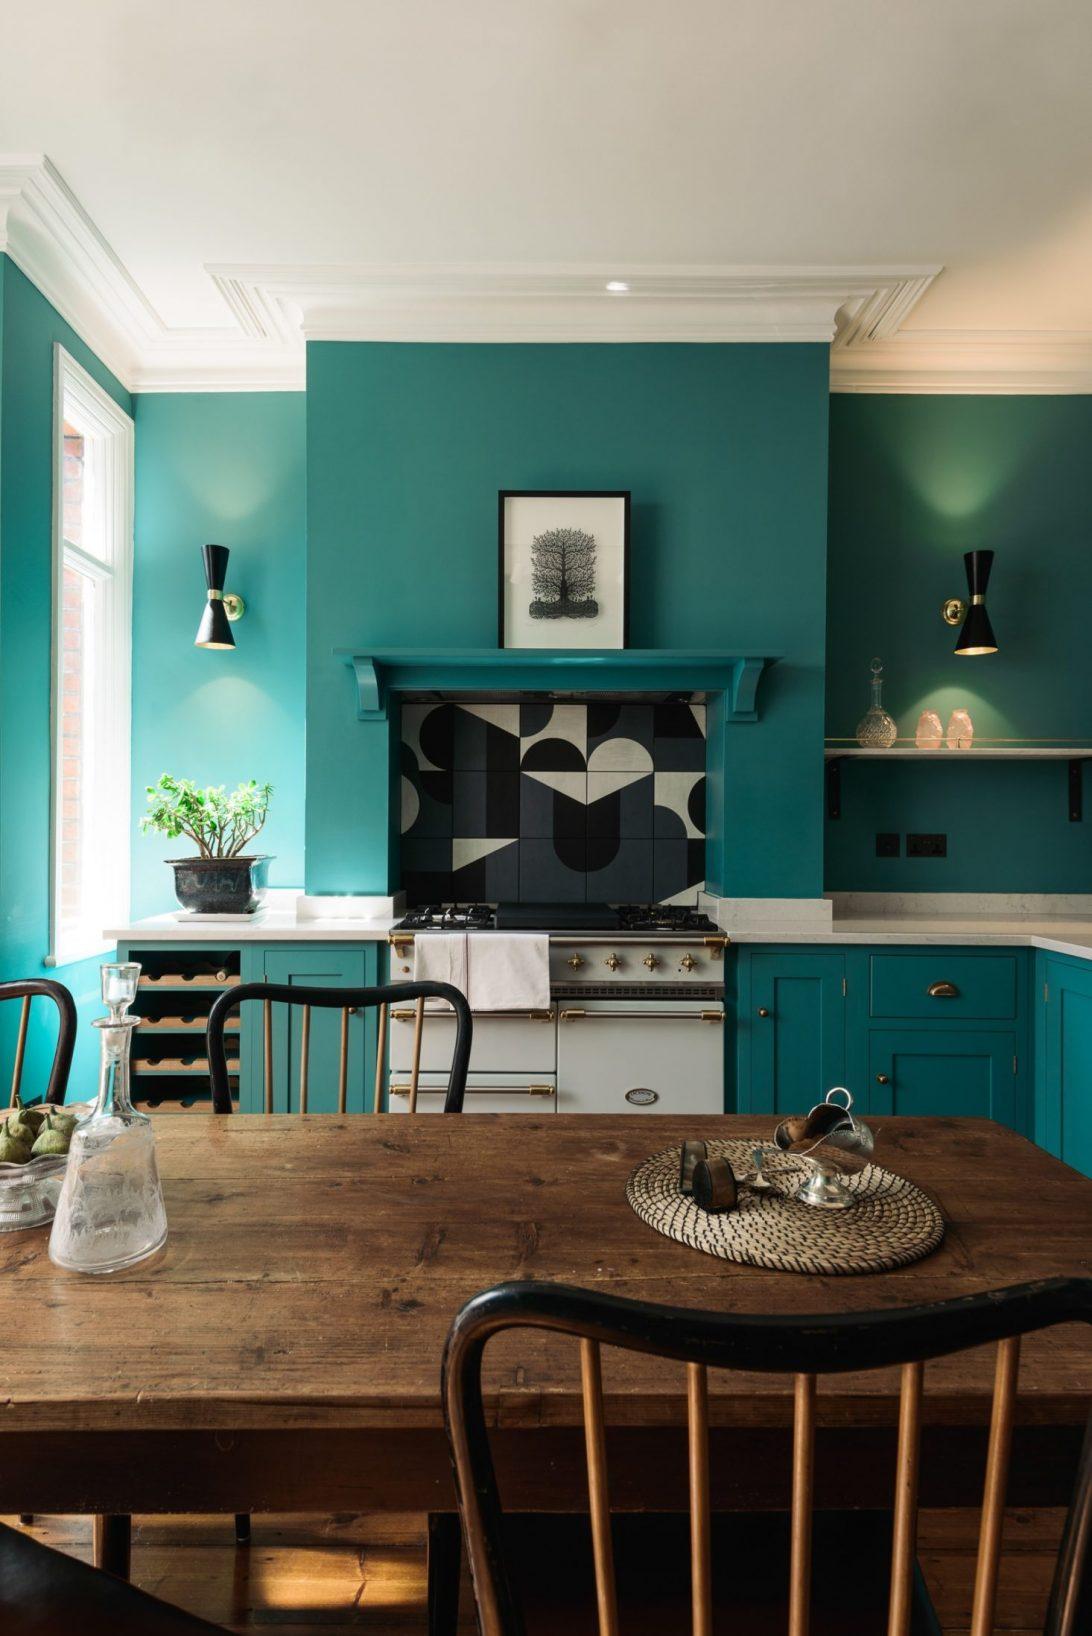 Fireplace Backsplash Inspirational Glass Backsplash Home Depot Green Subway Tile Kitchen Modern